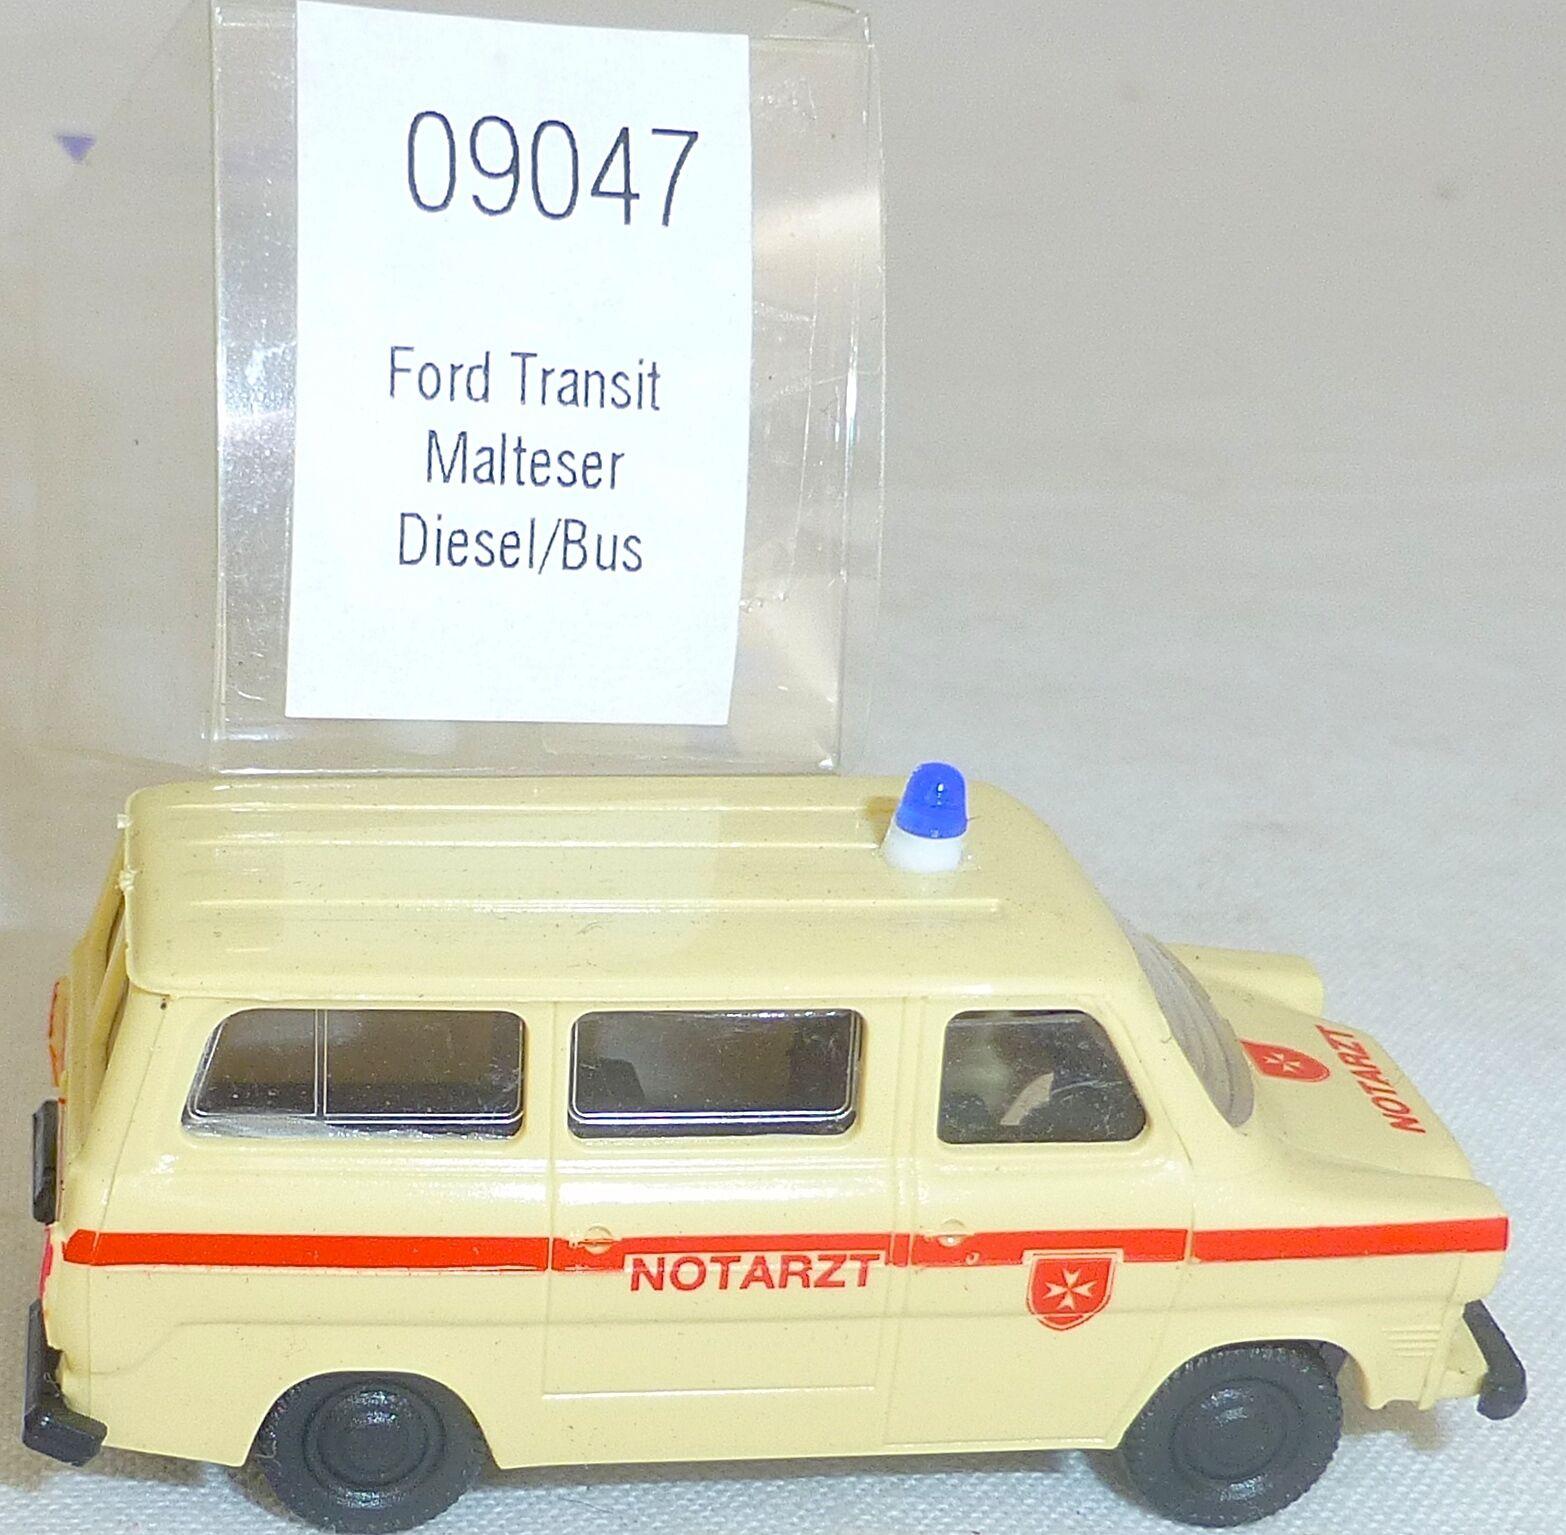 Maltés Ford Transit Ambulancia Diésel Imu Euromodell 09047 H0 1 87 Emb.orig